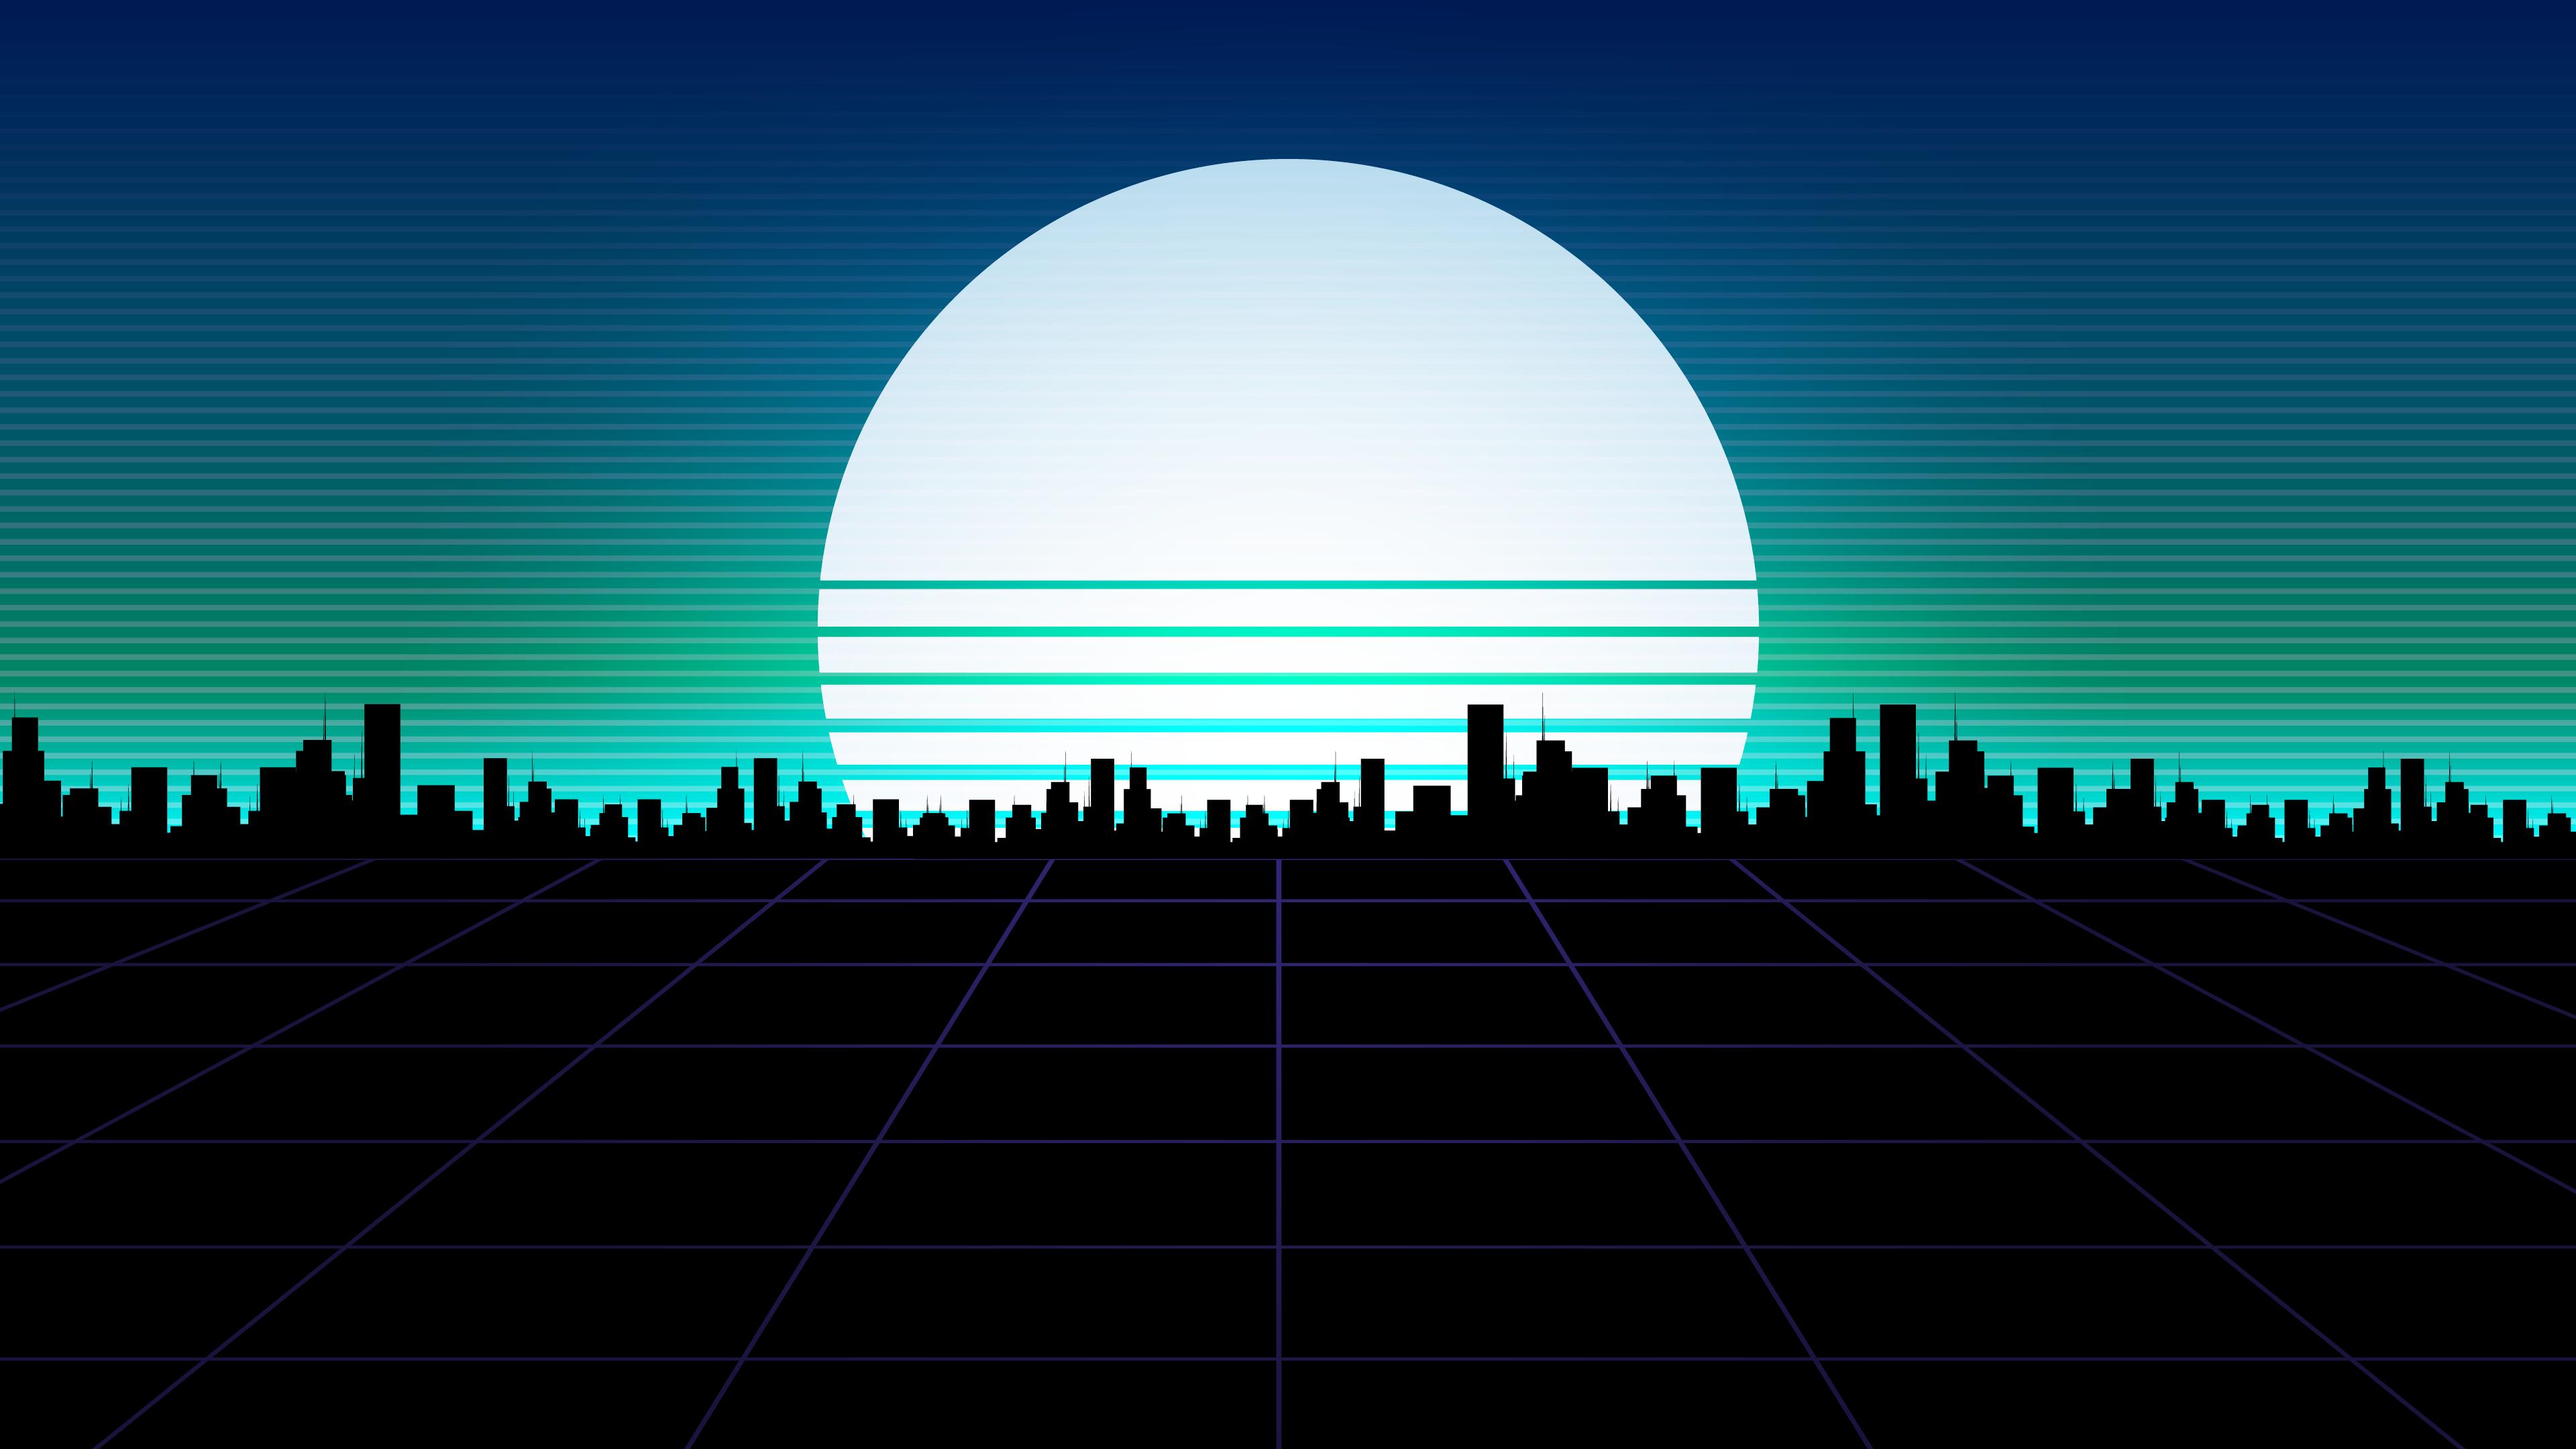 Amazing retro wave city background wallpaper 4k